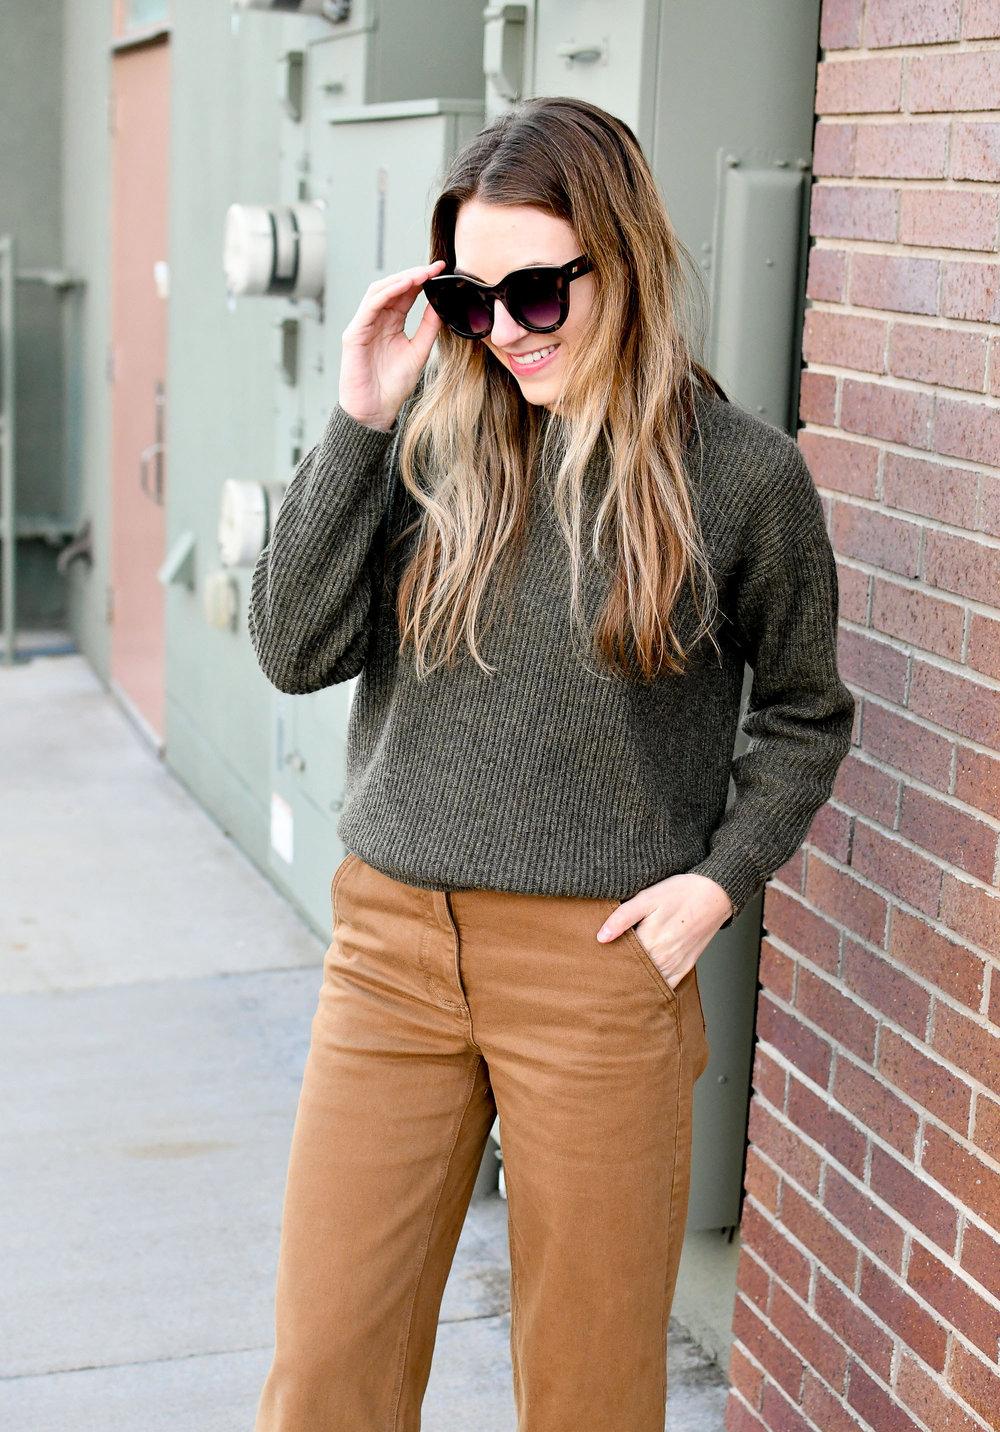 Loden cashmere sweater + ochre wide leg pants winter outfit — Cotton Cashmere Cat Hair